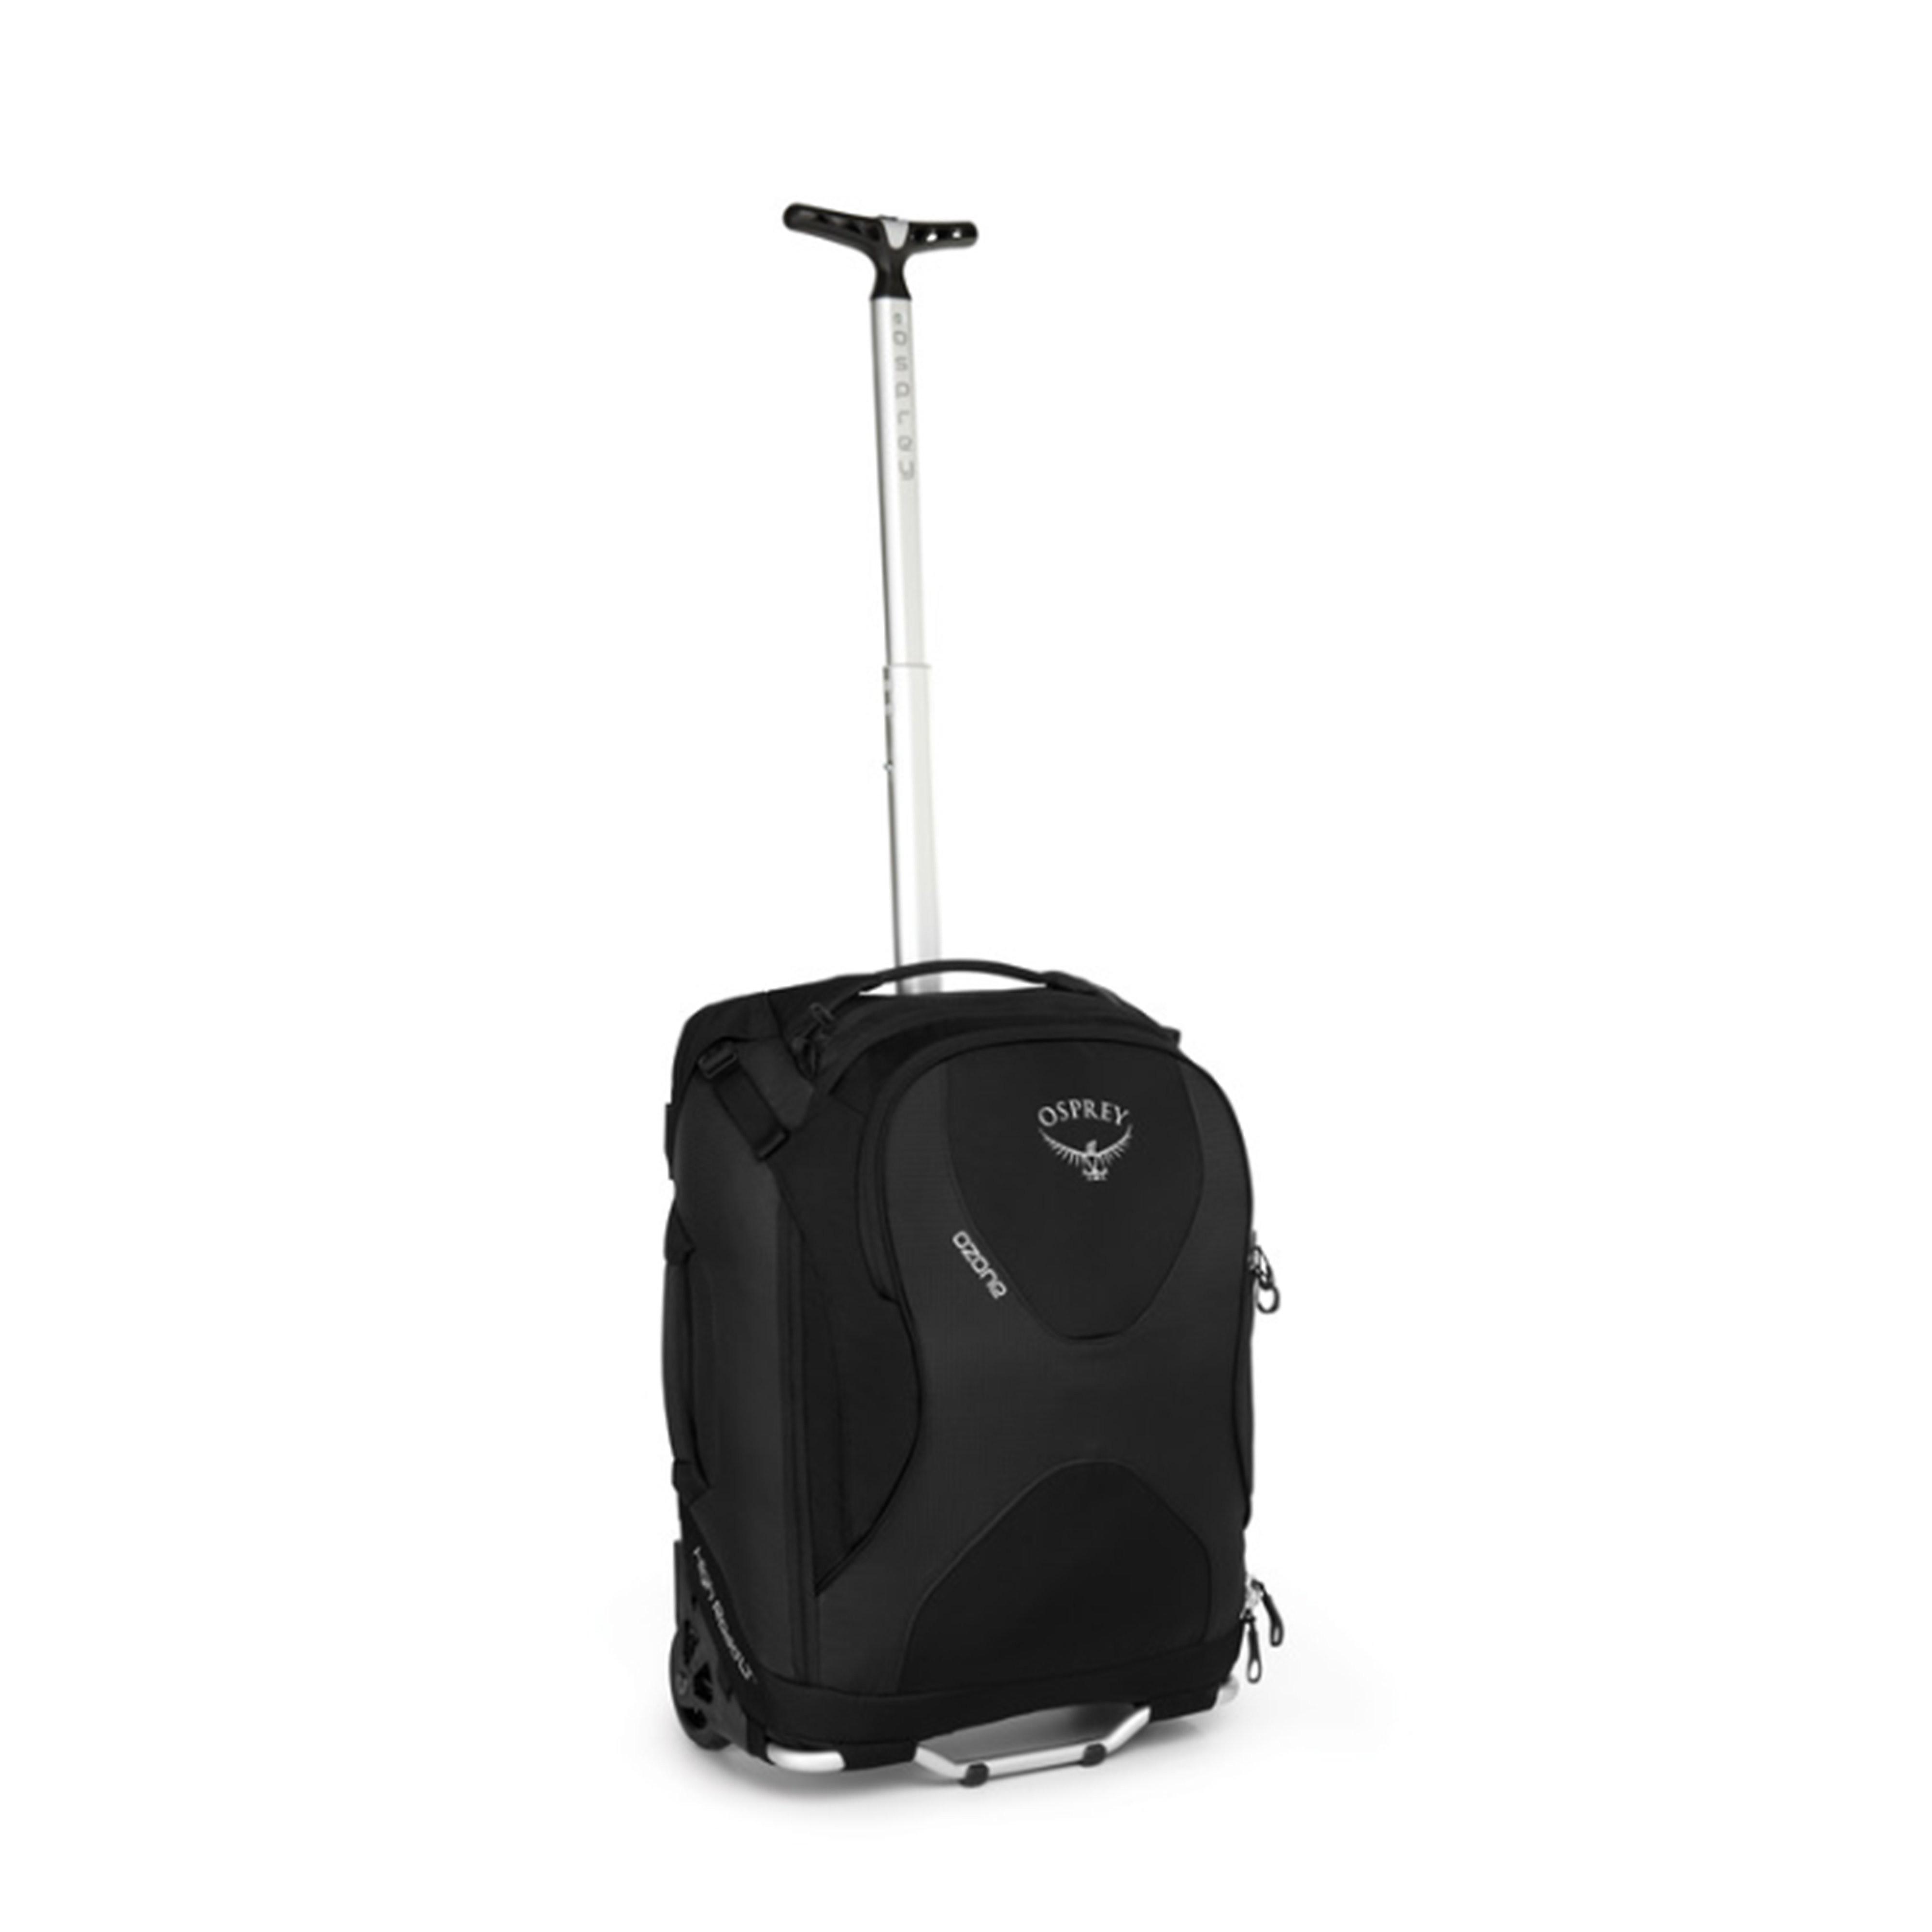 Osprey Ozone 36 Roller Bag